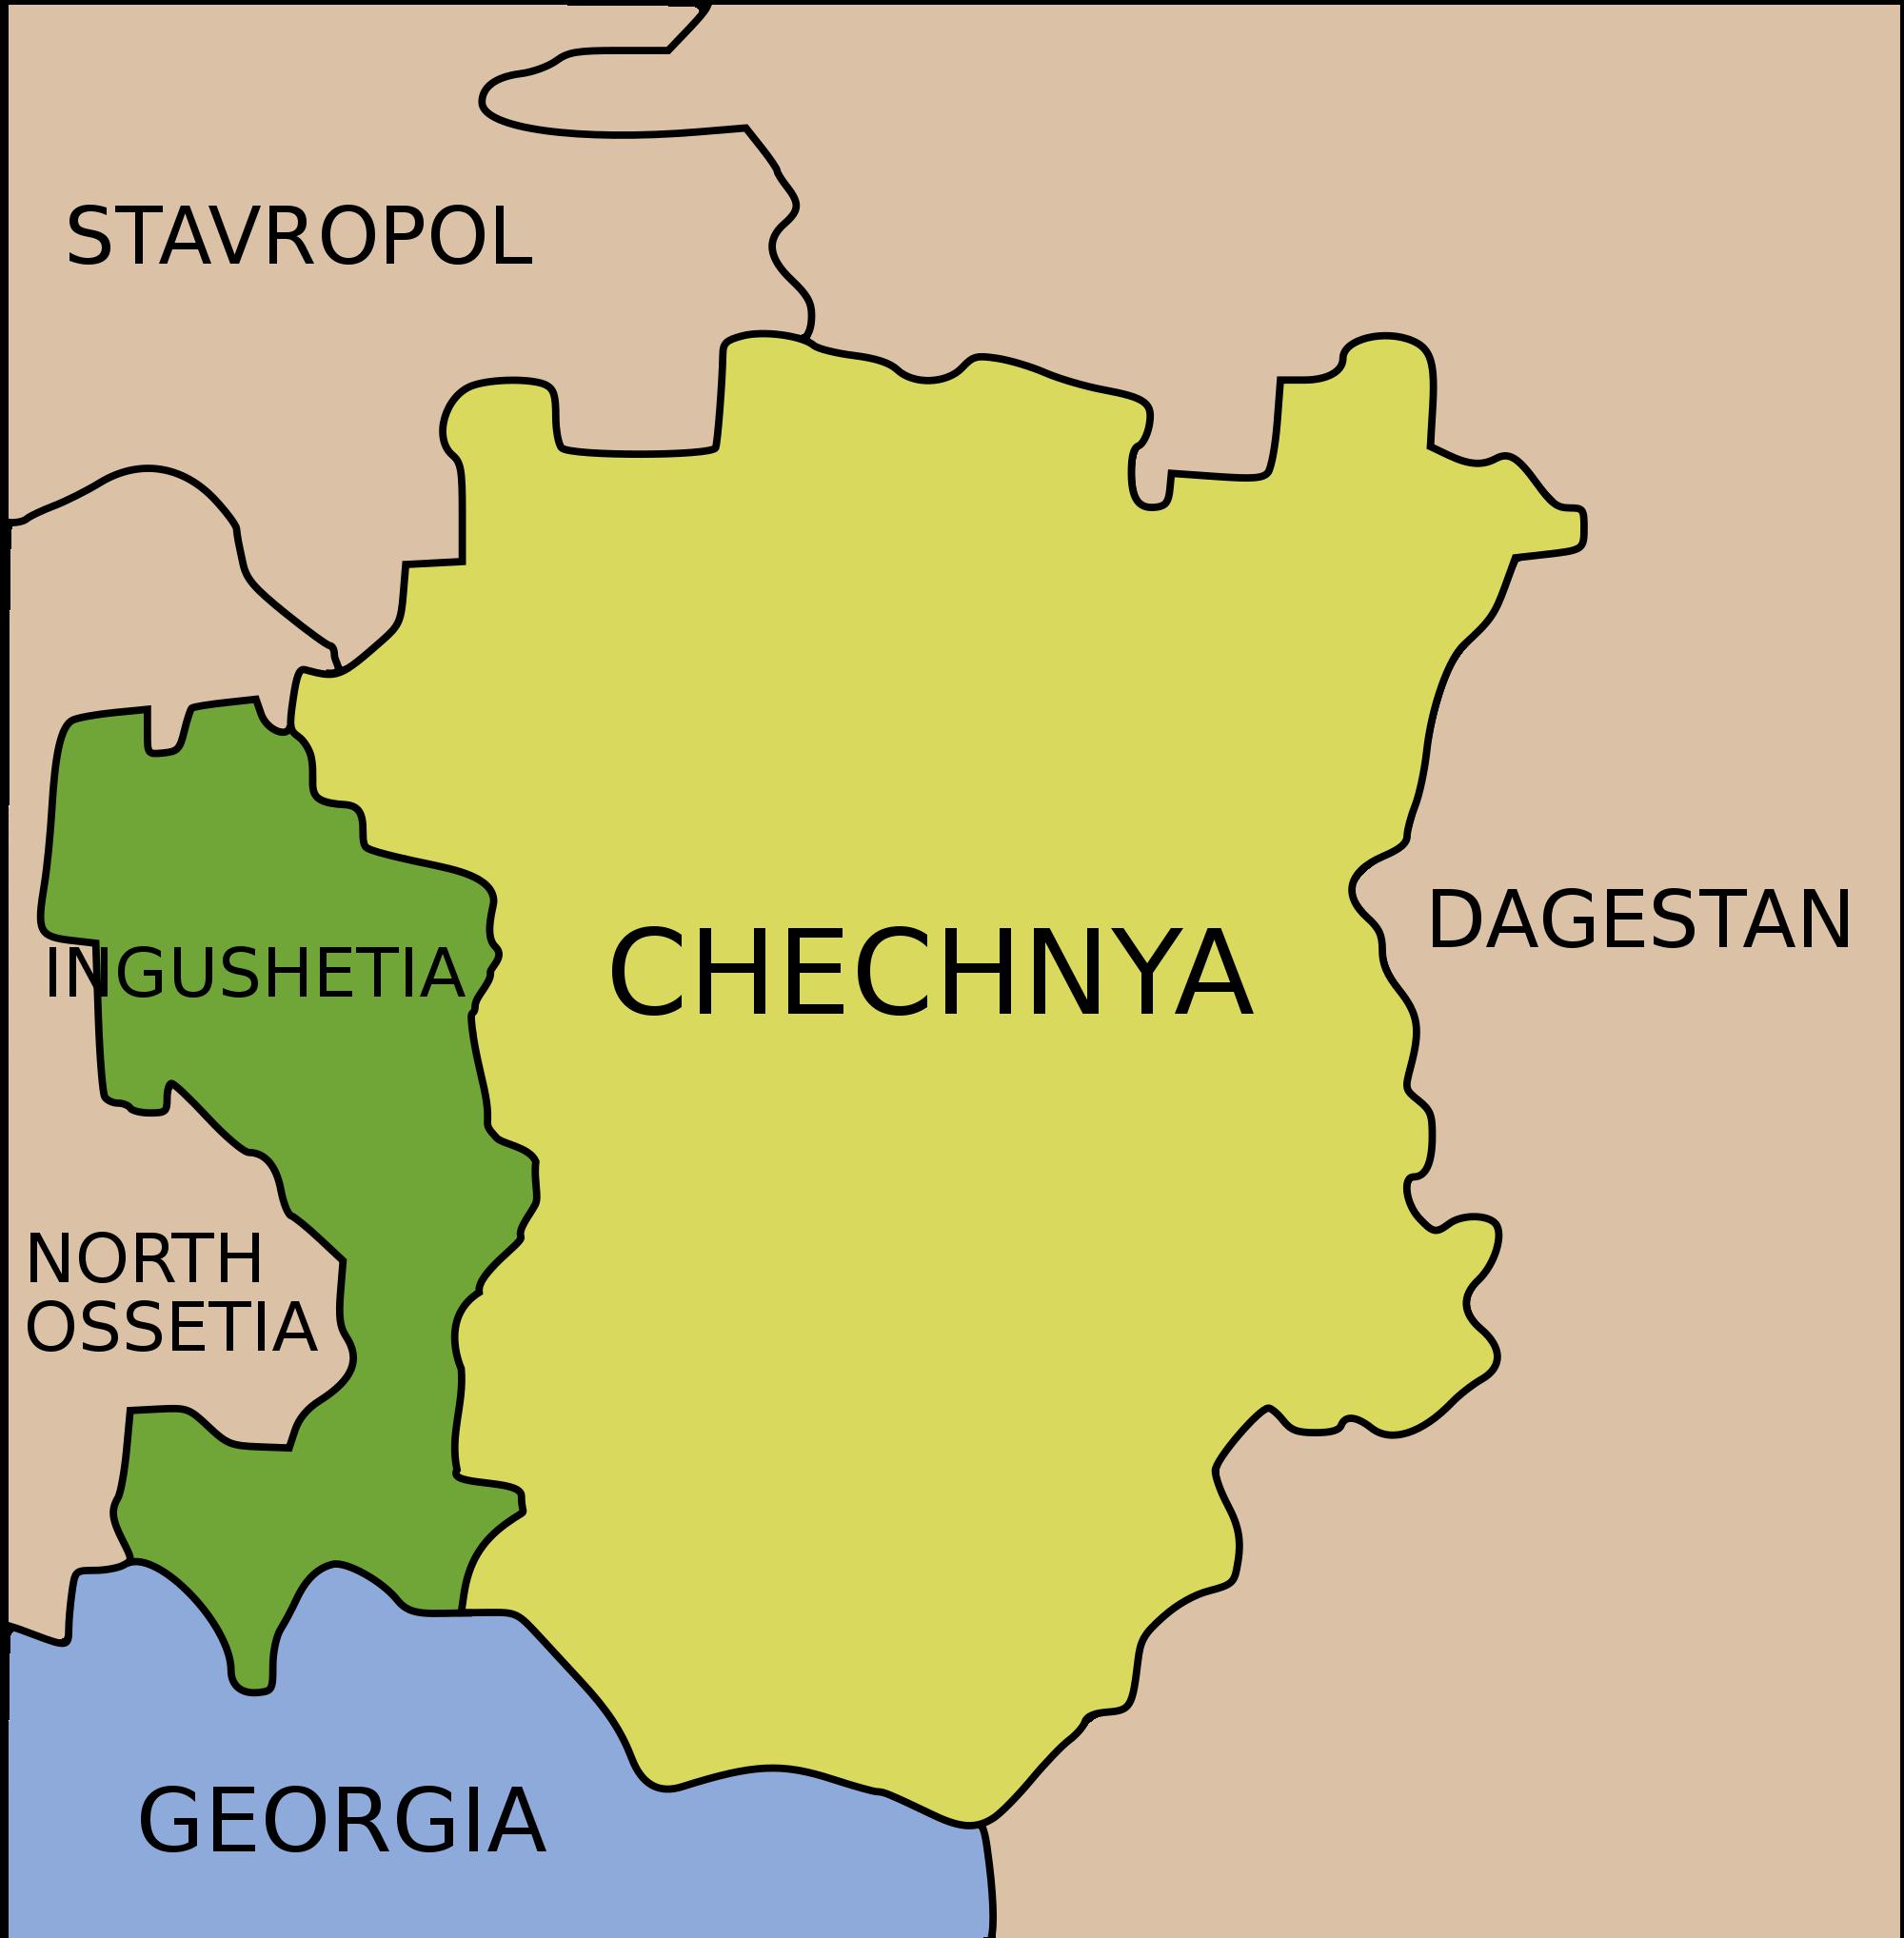 Atlas of Chechnya - Wikimedia Commons on azerbaijan map, armenia map, serbia map, russia map, north korea map, second chechen war, ramzan kadyrov, slovenia map, shamil basayev, caucasus map, beslan school hostage crisis, pakistan map, chechen people, kyrgyzstan map, novaya zemlya map, kalmykia map, uzbekistan map, saint petersburg, first chechen war, dagestan map, caucasus mountains, grozny map, siberia map, slovakia map, moscow map, ukraine map, europe map, north caucasus, georgia map, moscow theater hostage crisis,